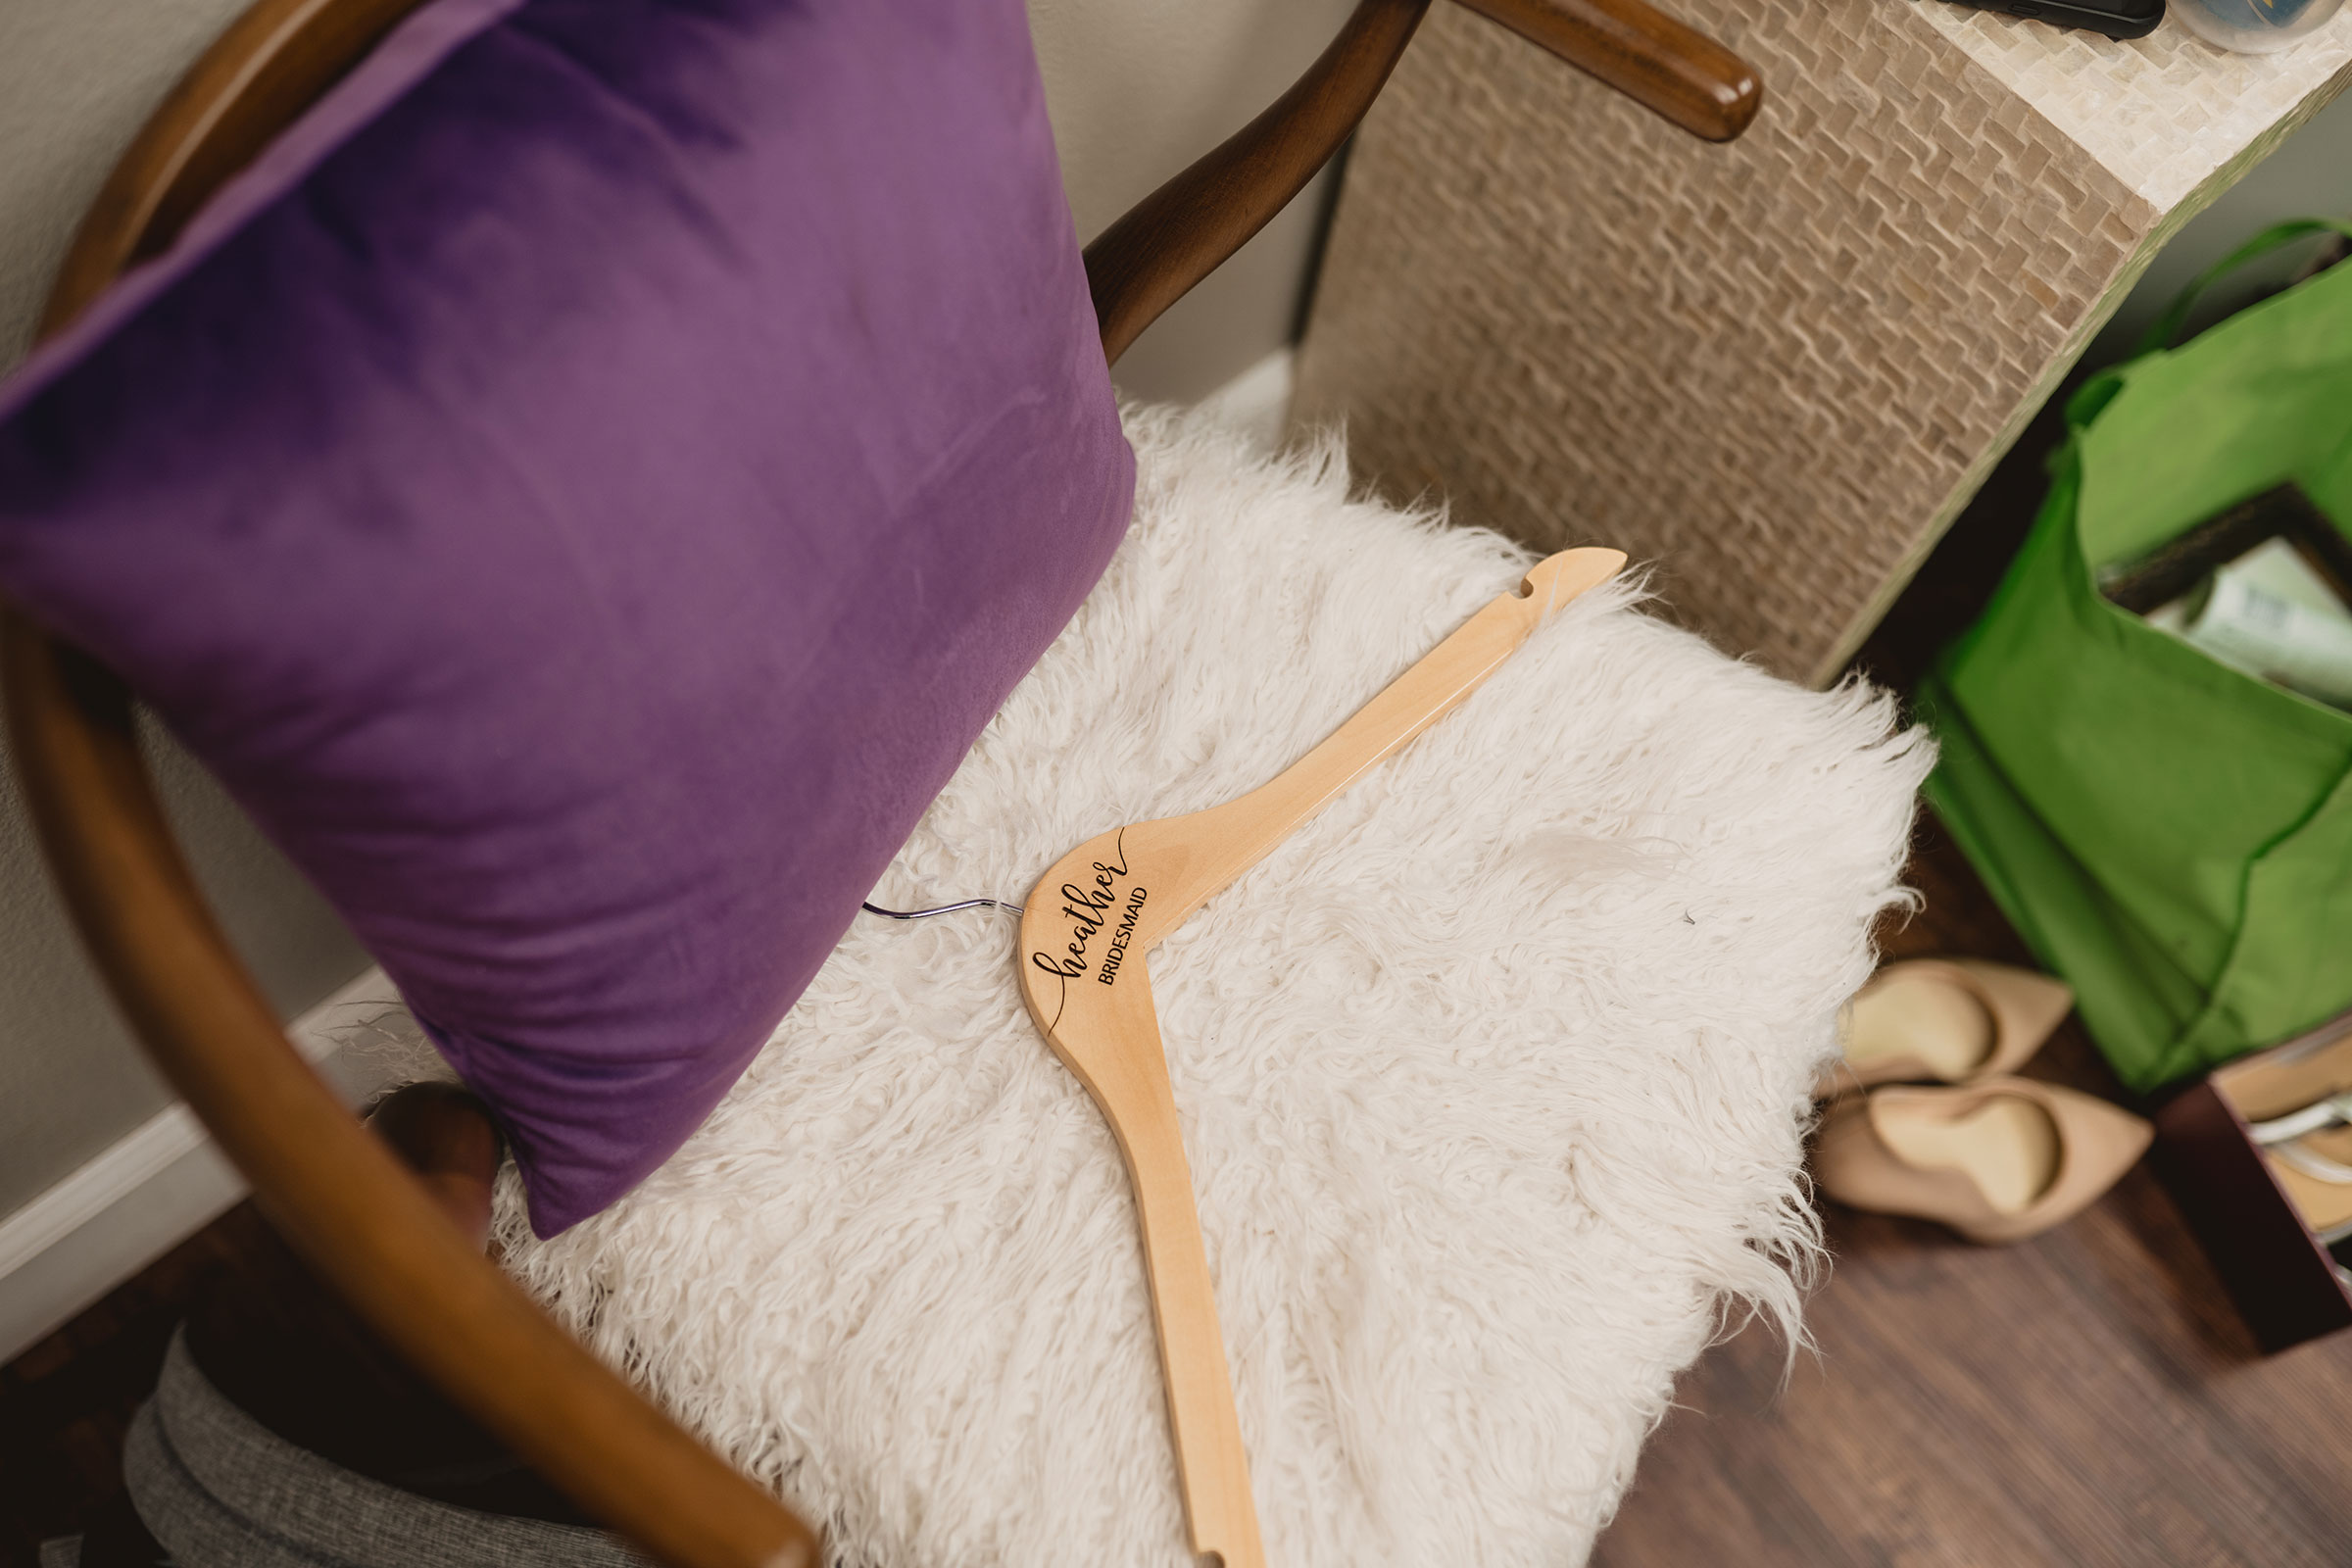 bridesmaid-hanger-with-name-decades-event-center-building-desmoines-iowa-raelyn-ramey-photography..jpg